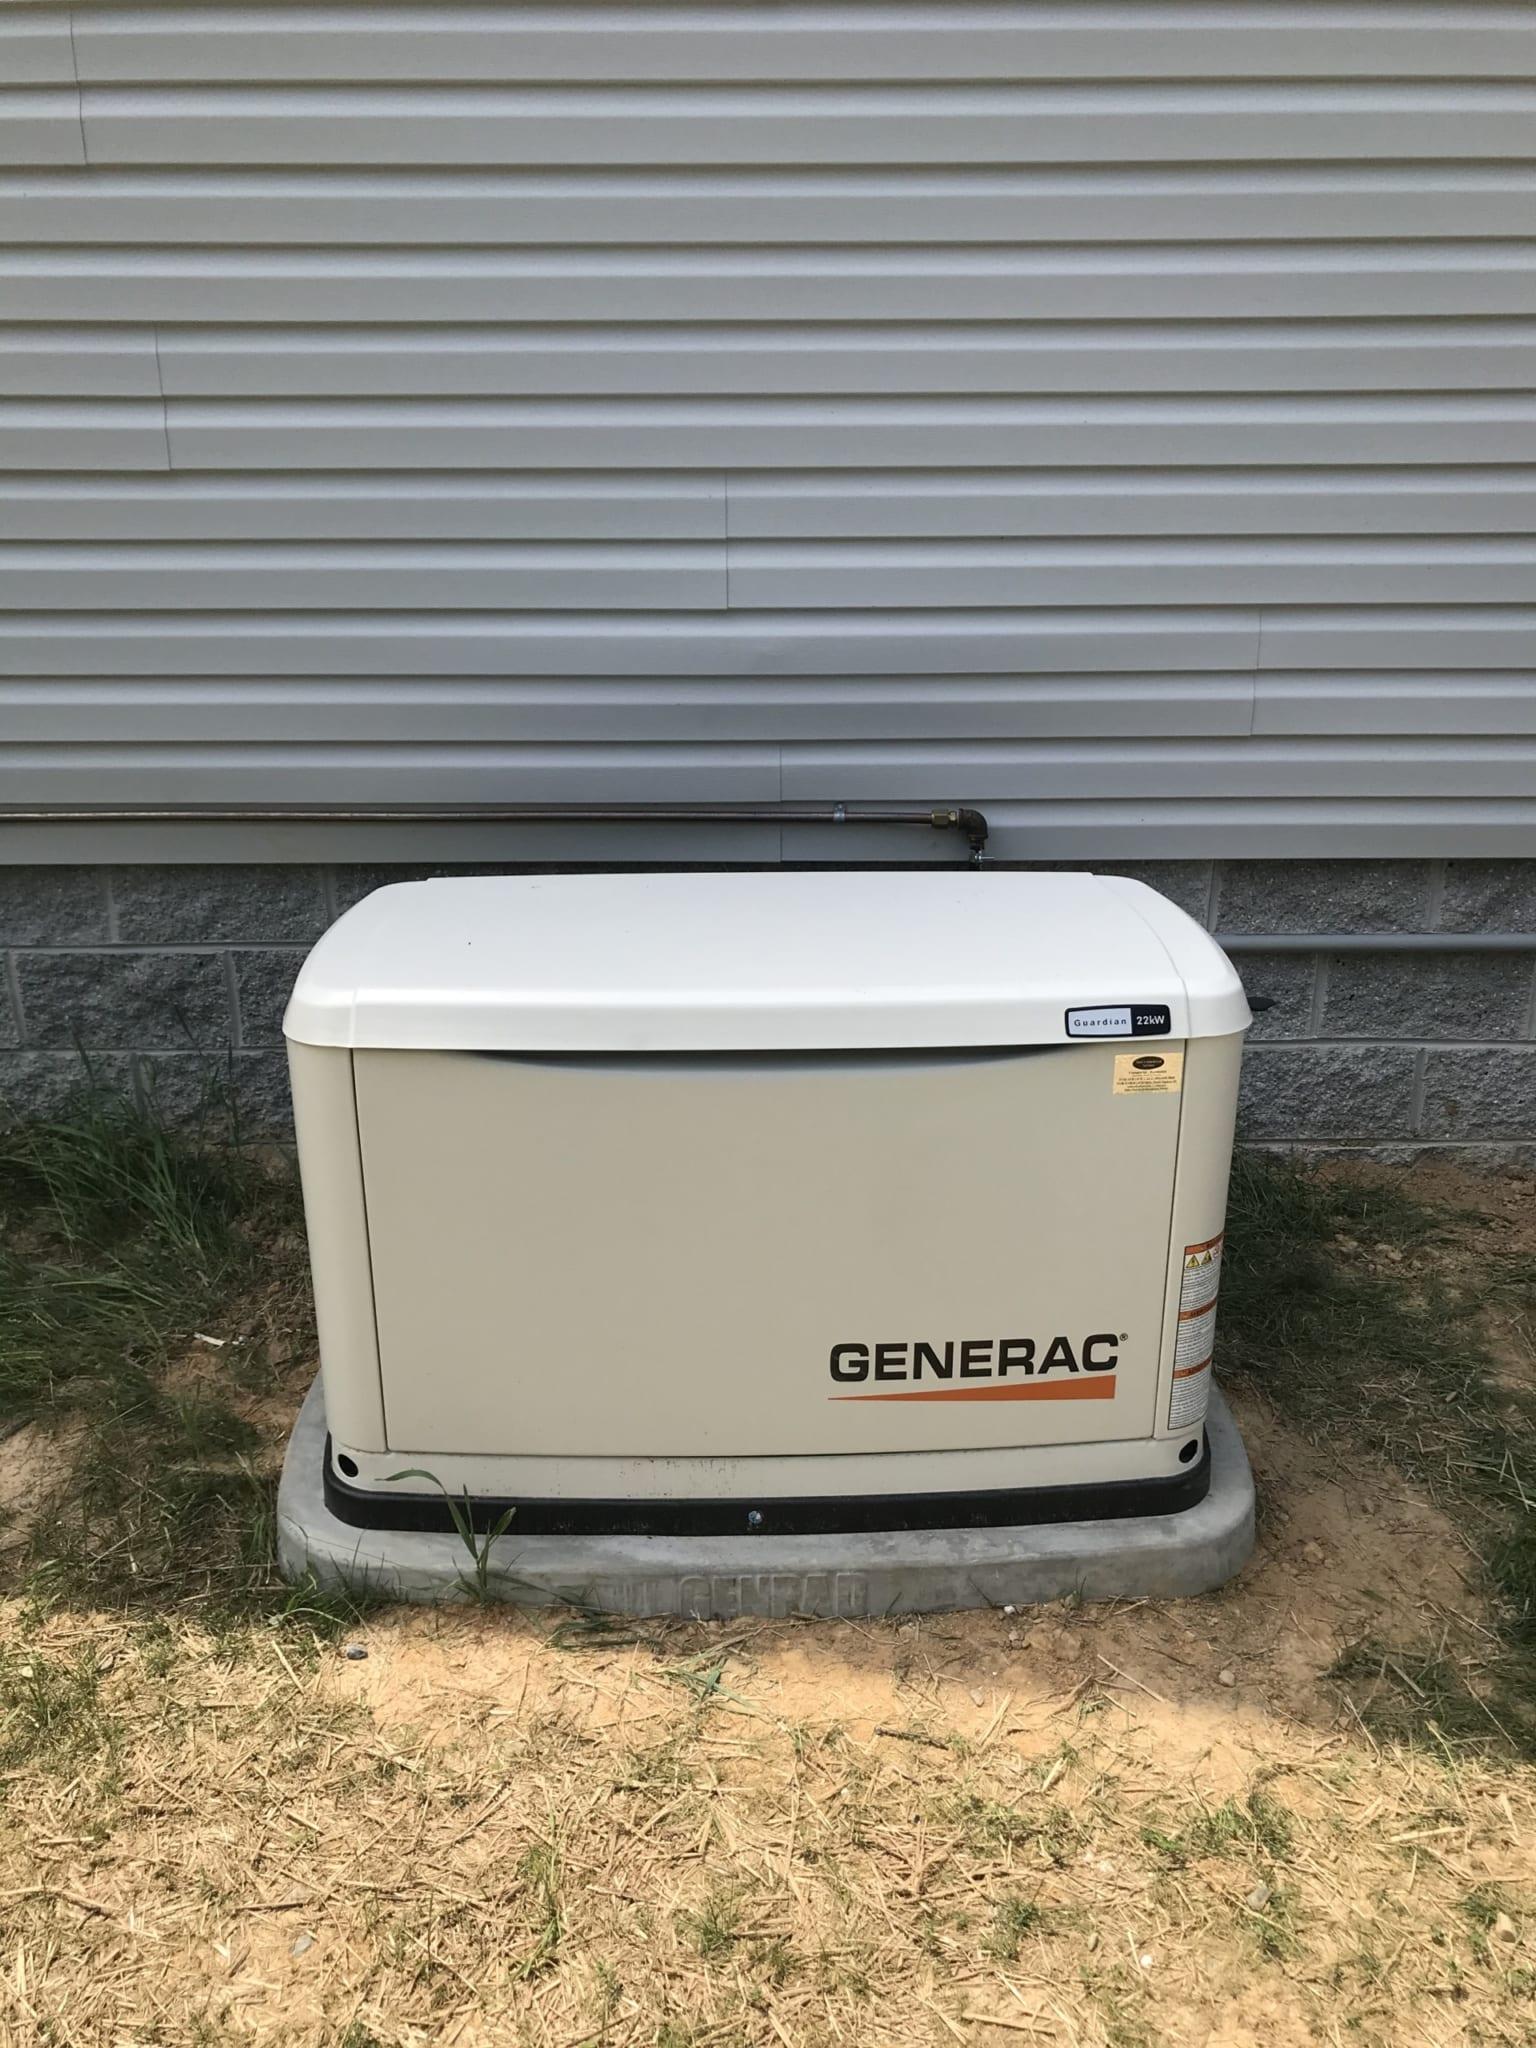 6.9.20 Nottoway Generac Automatic Standby Generator